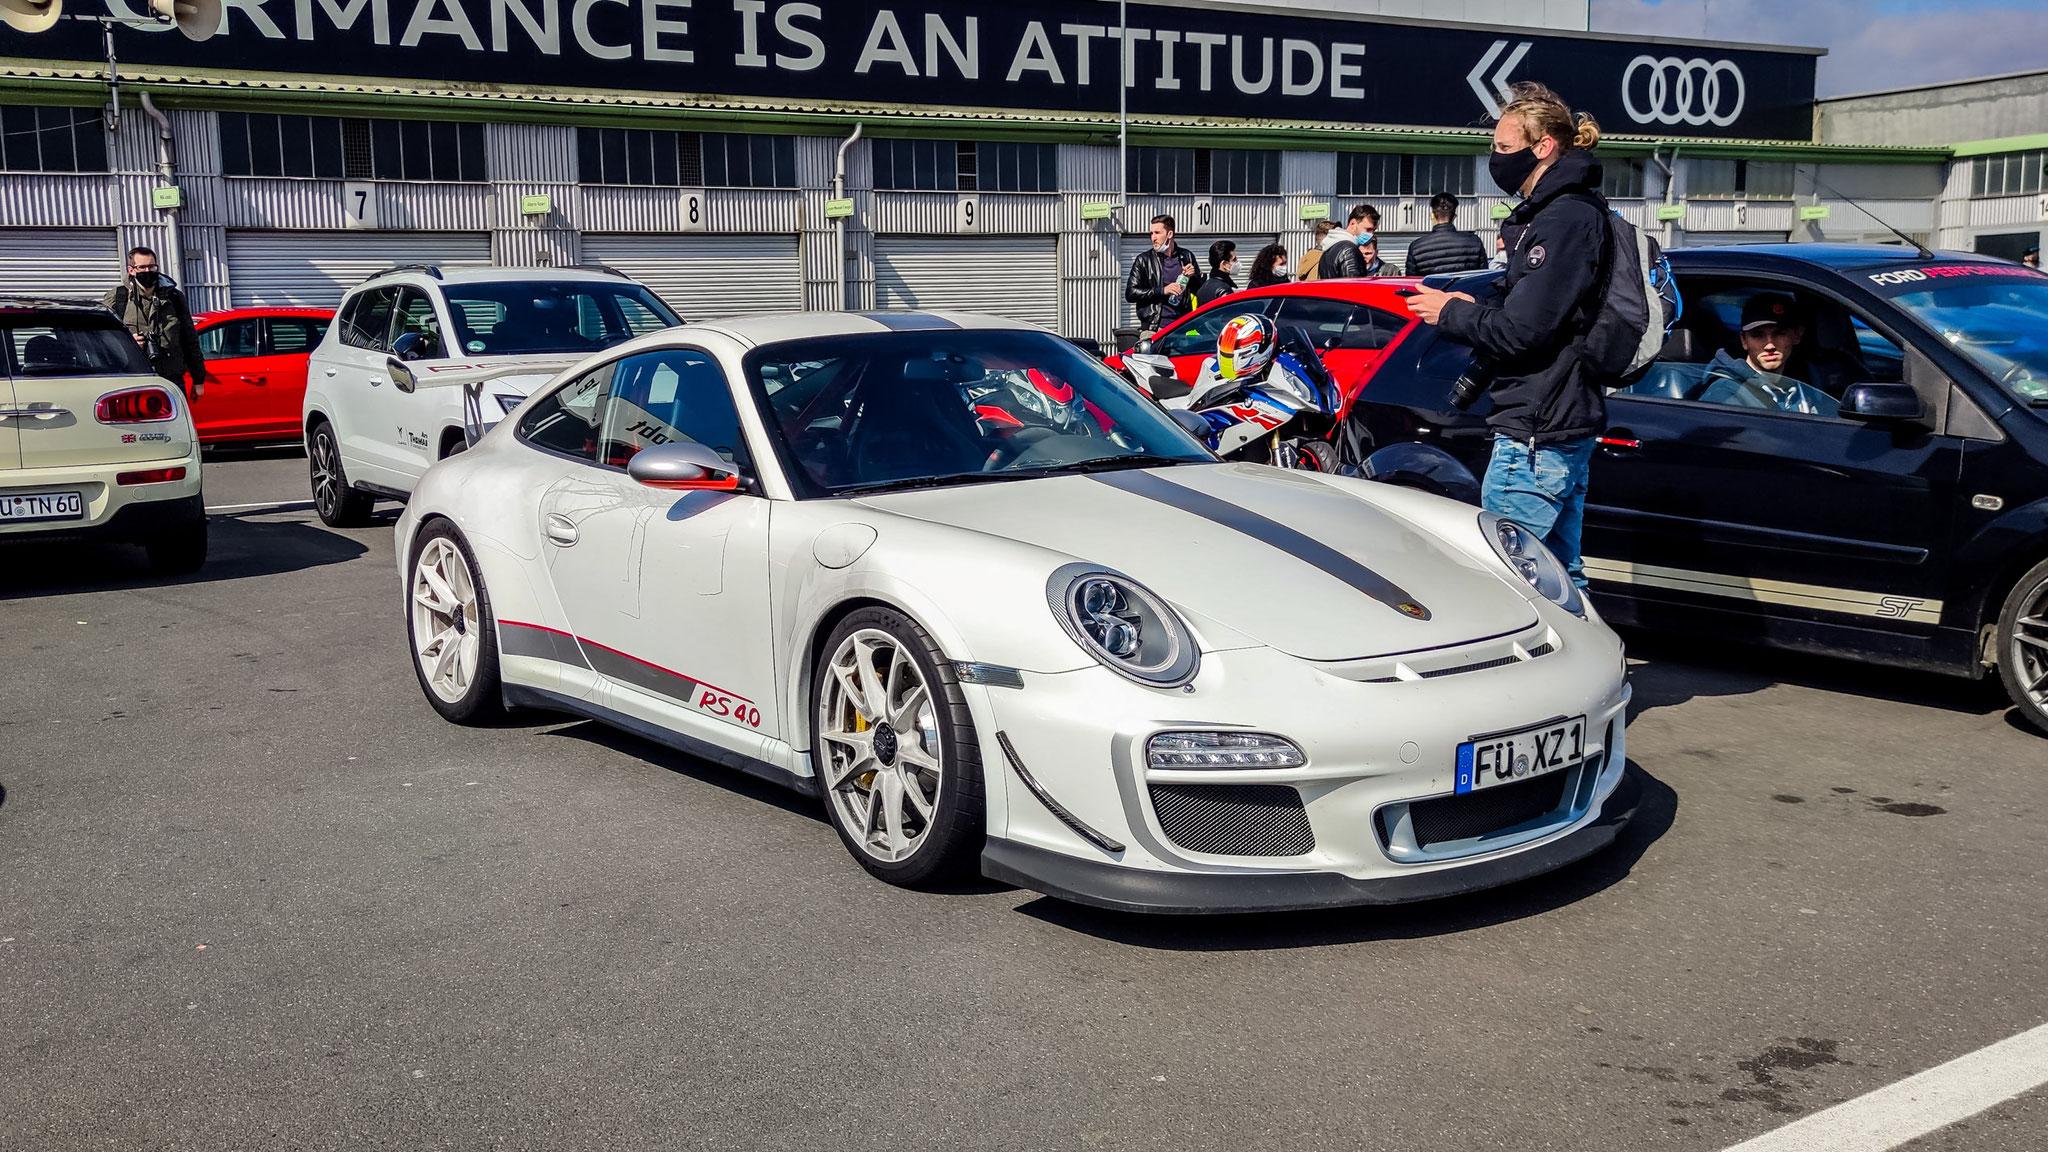 Porsche 911 GT3 RS 4.0 - FÜ-XZ-1